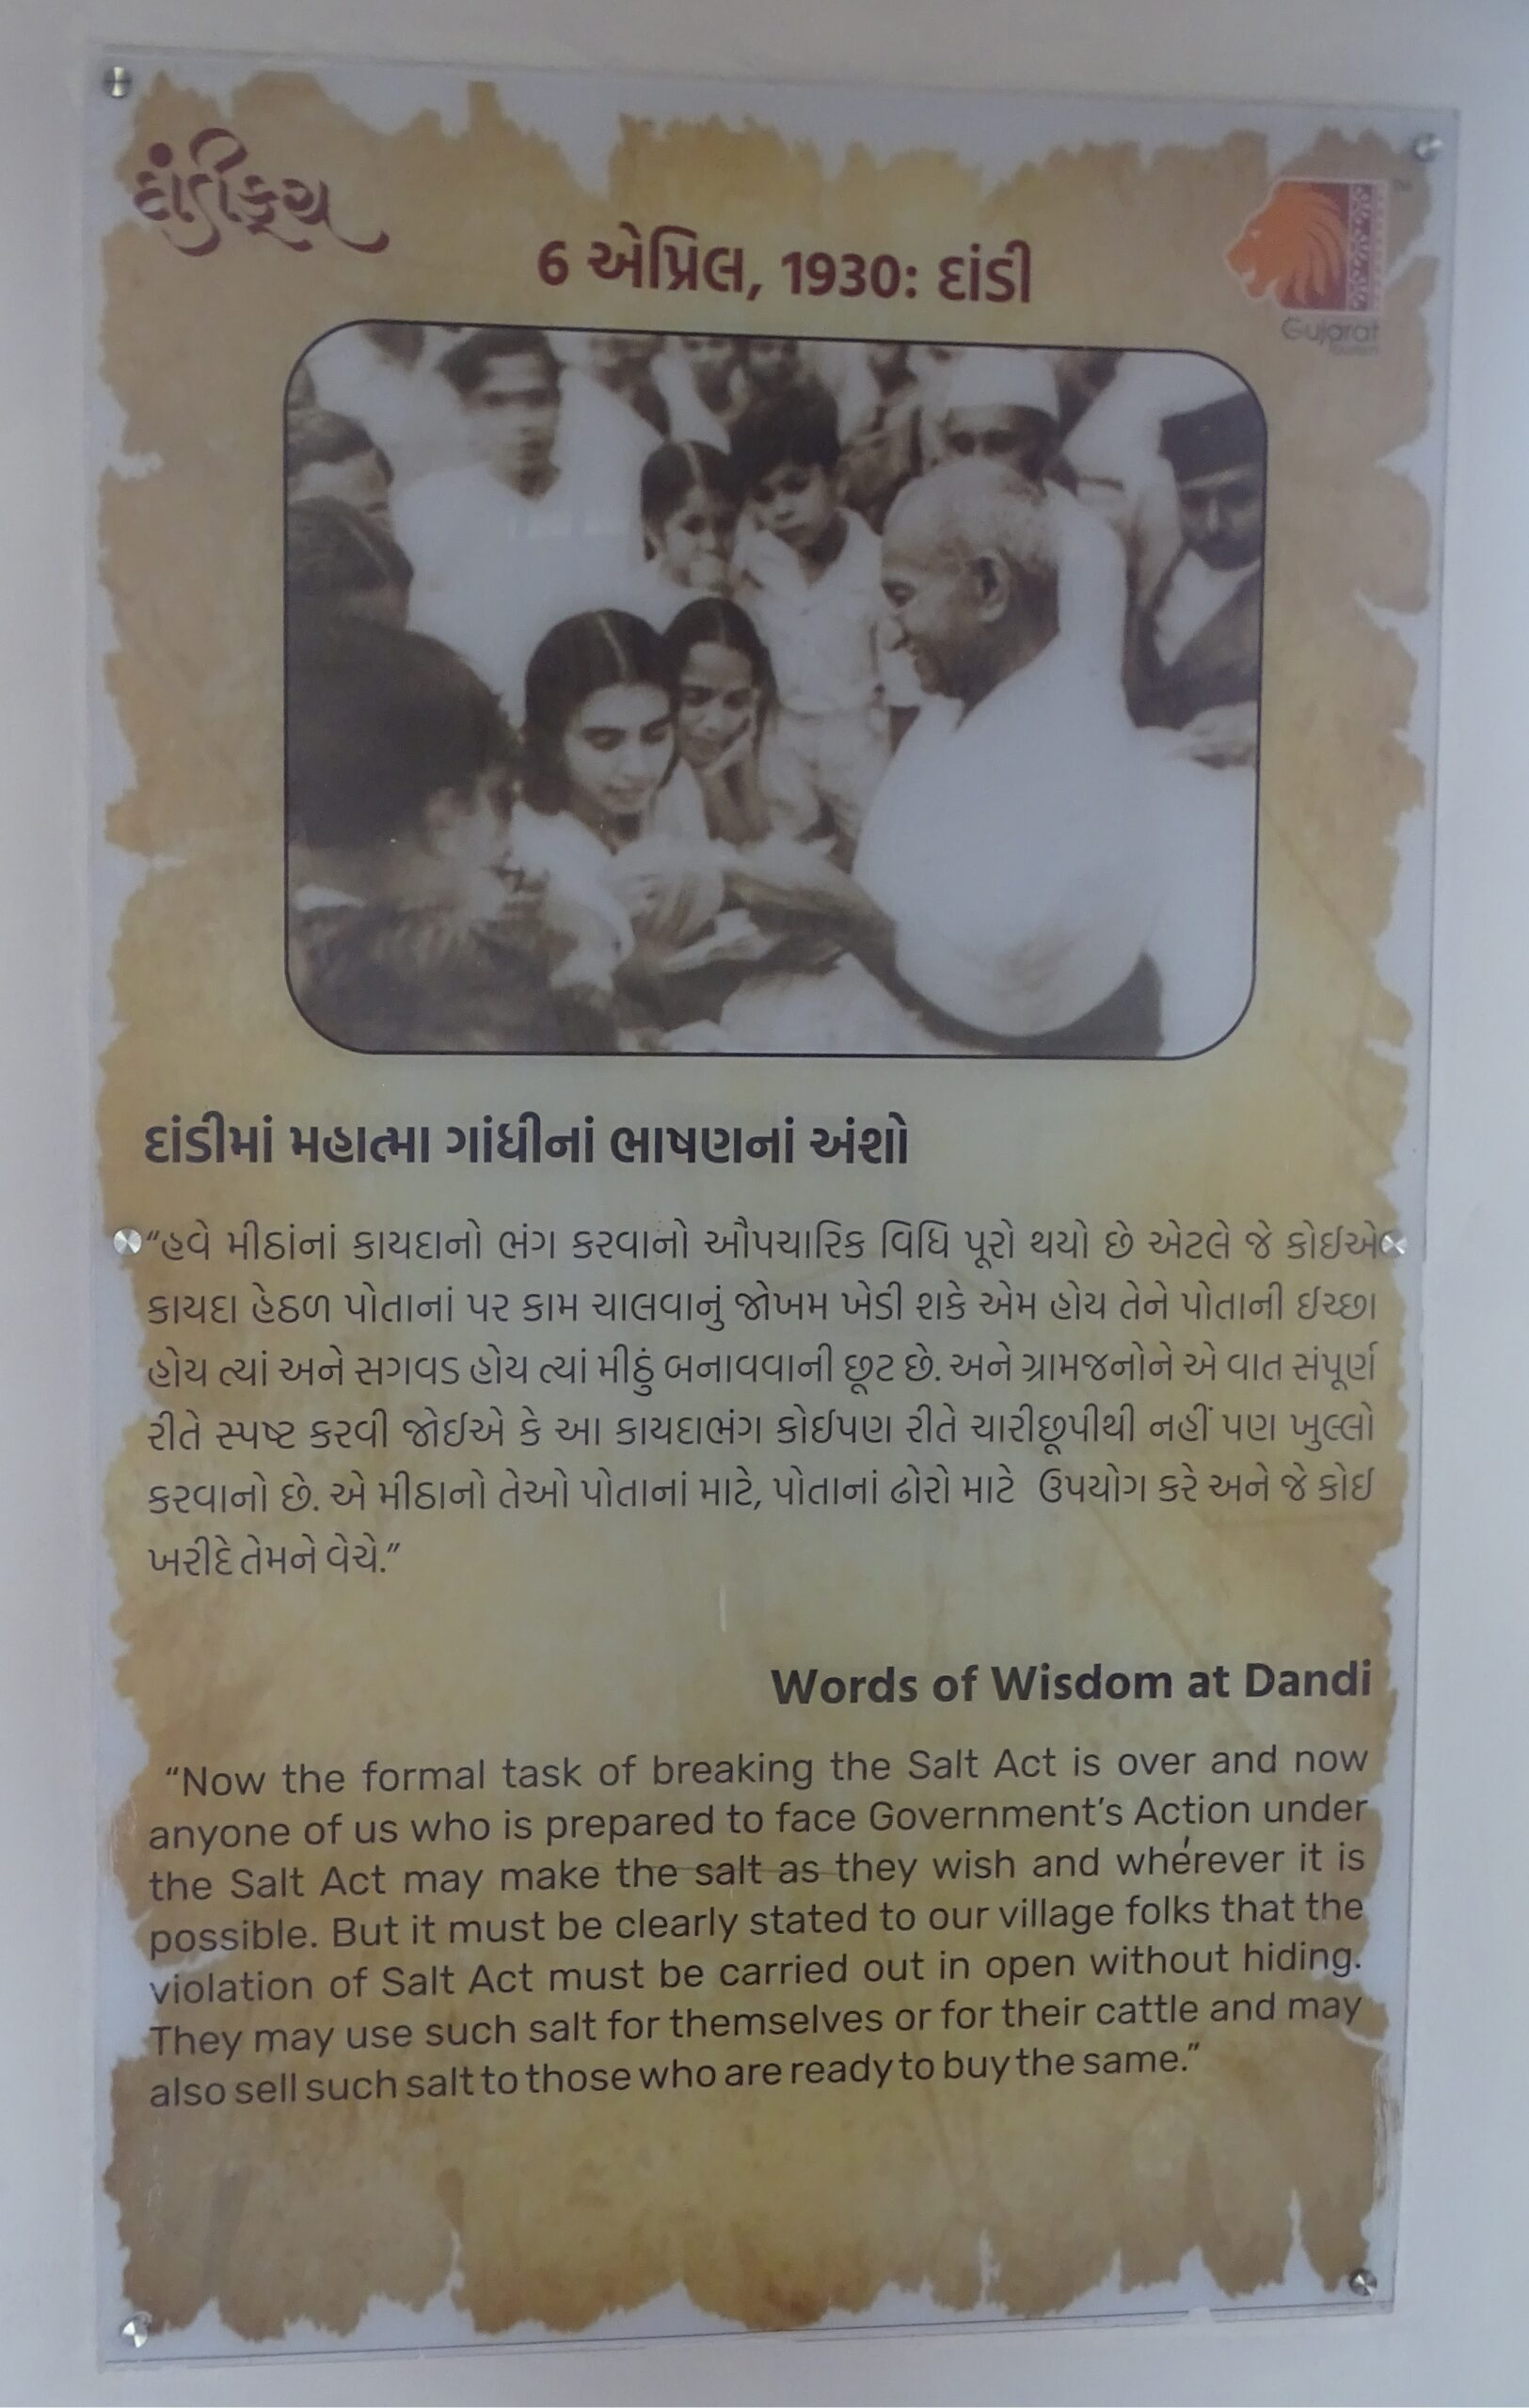 6th April, 1930 - Words of Wisdom by Mahatma Gandhi at Dandi, Gujarat